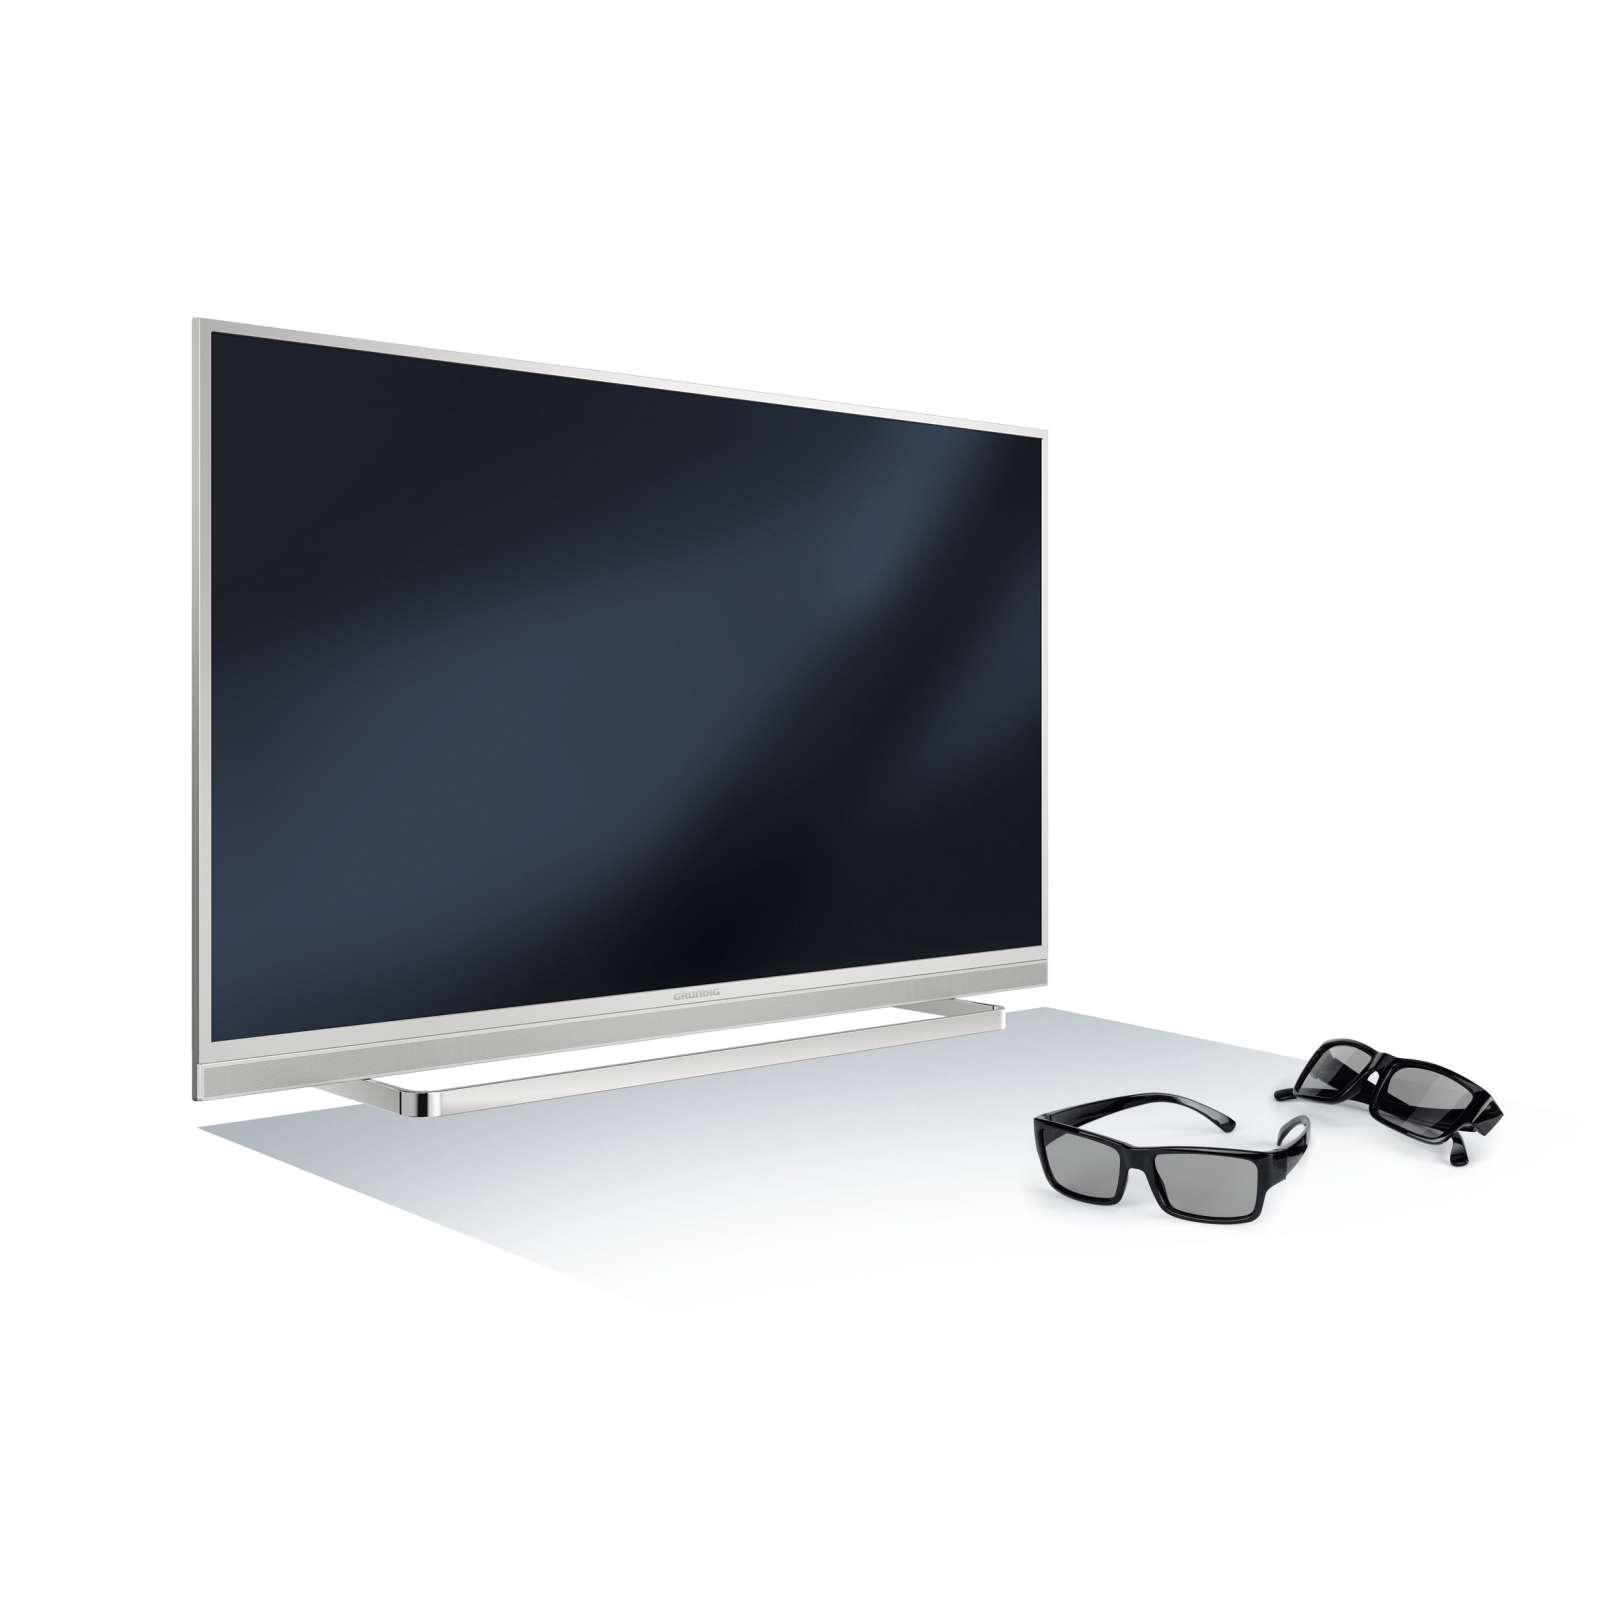 55 zoll grundig tv led fernseher elektro risch. Black Bedroom Furniture Sets. Home Design Ideas